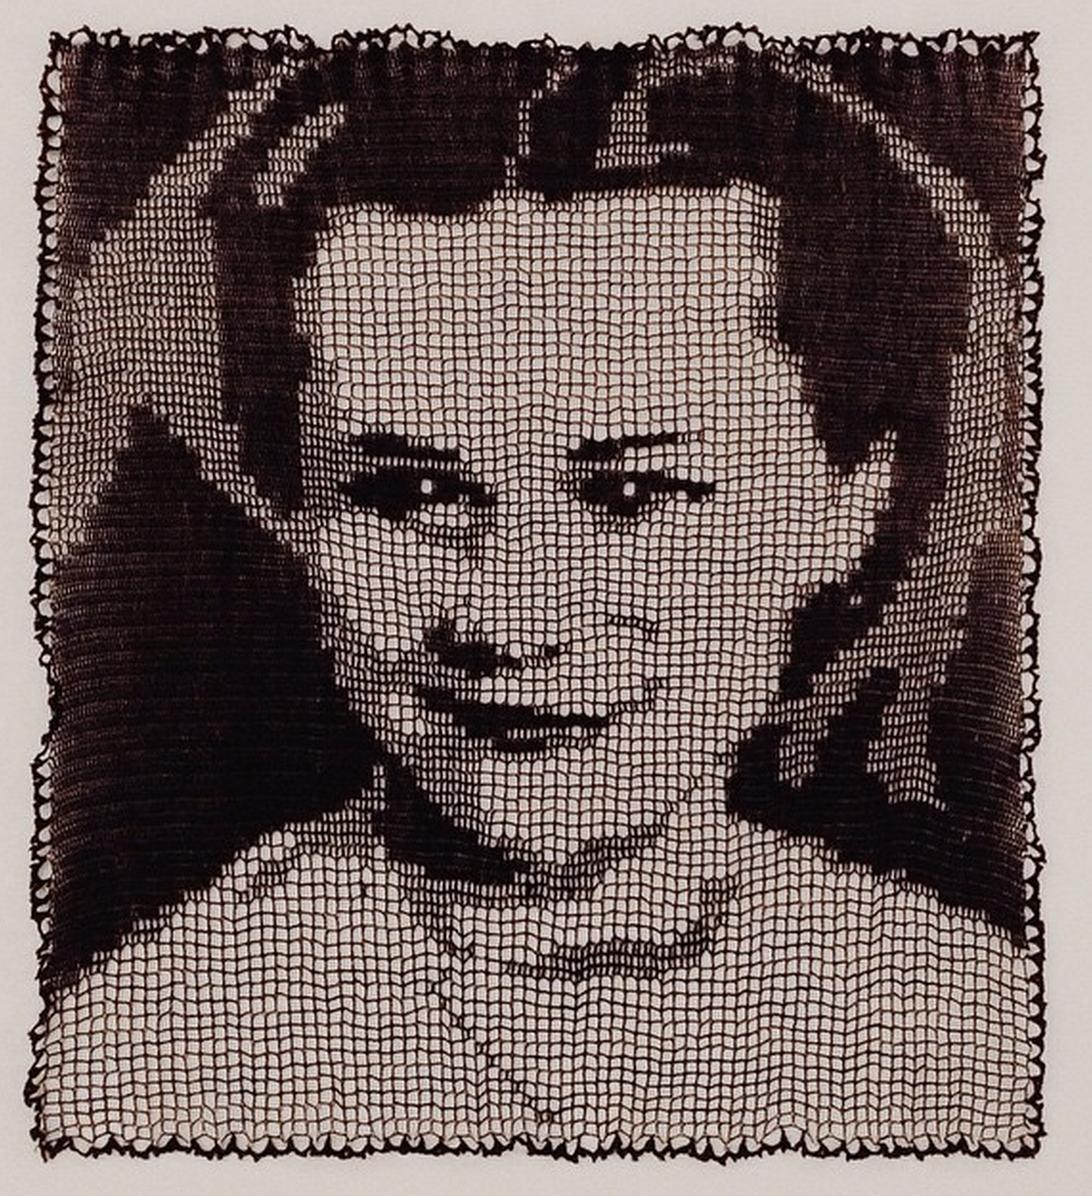 filet-crochet-portraits-2